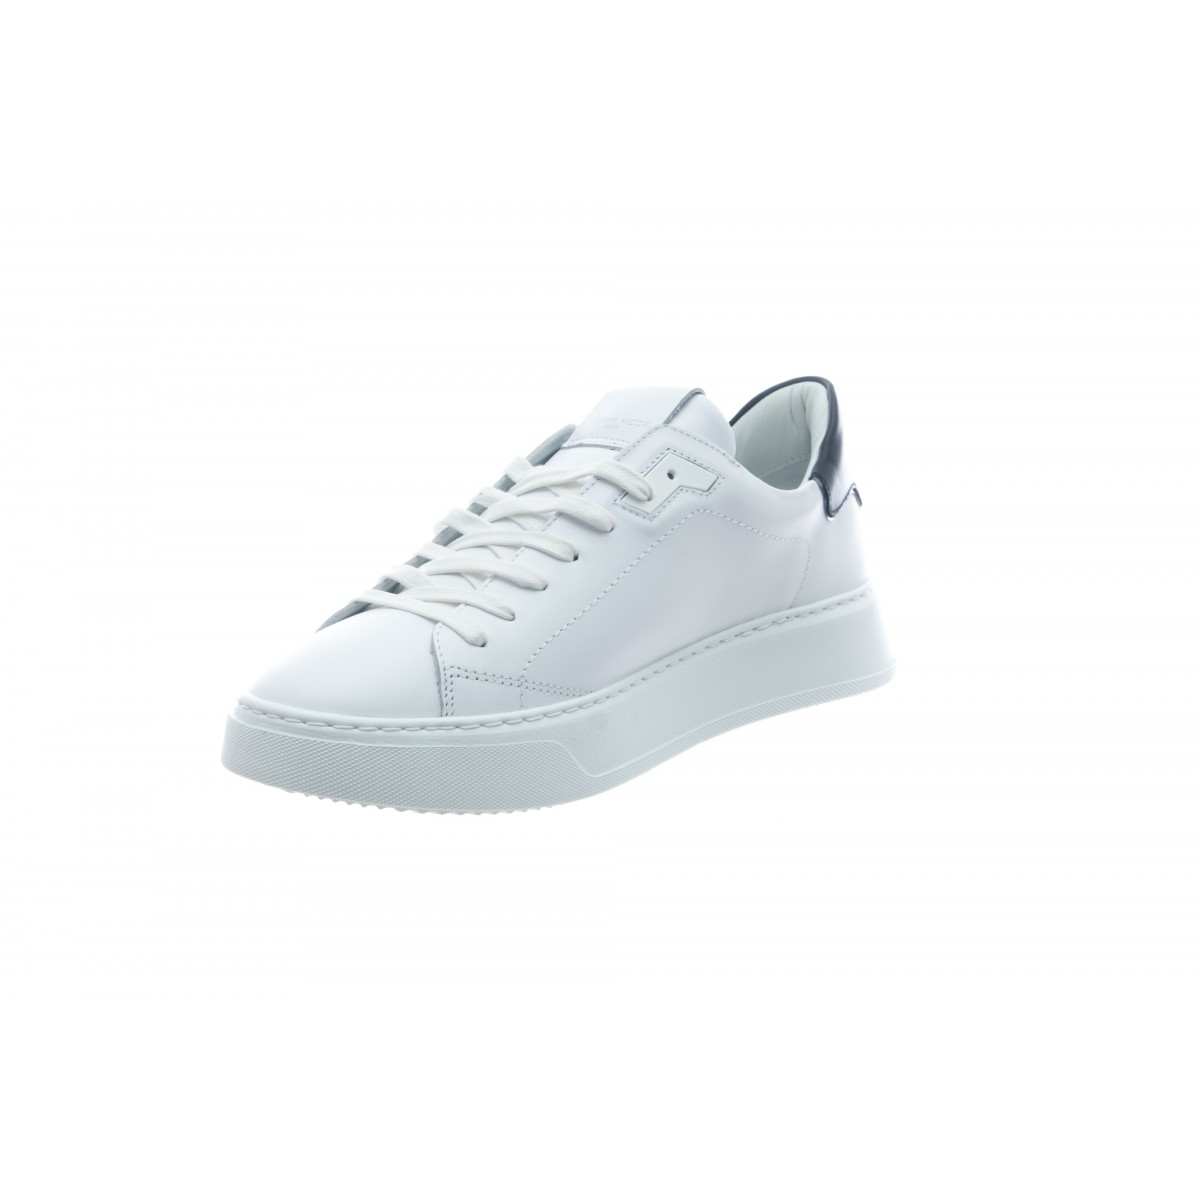 Sneakers Man - BTLU V007 temple